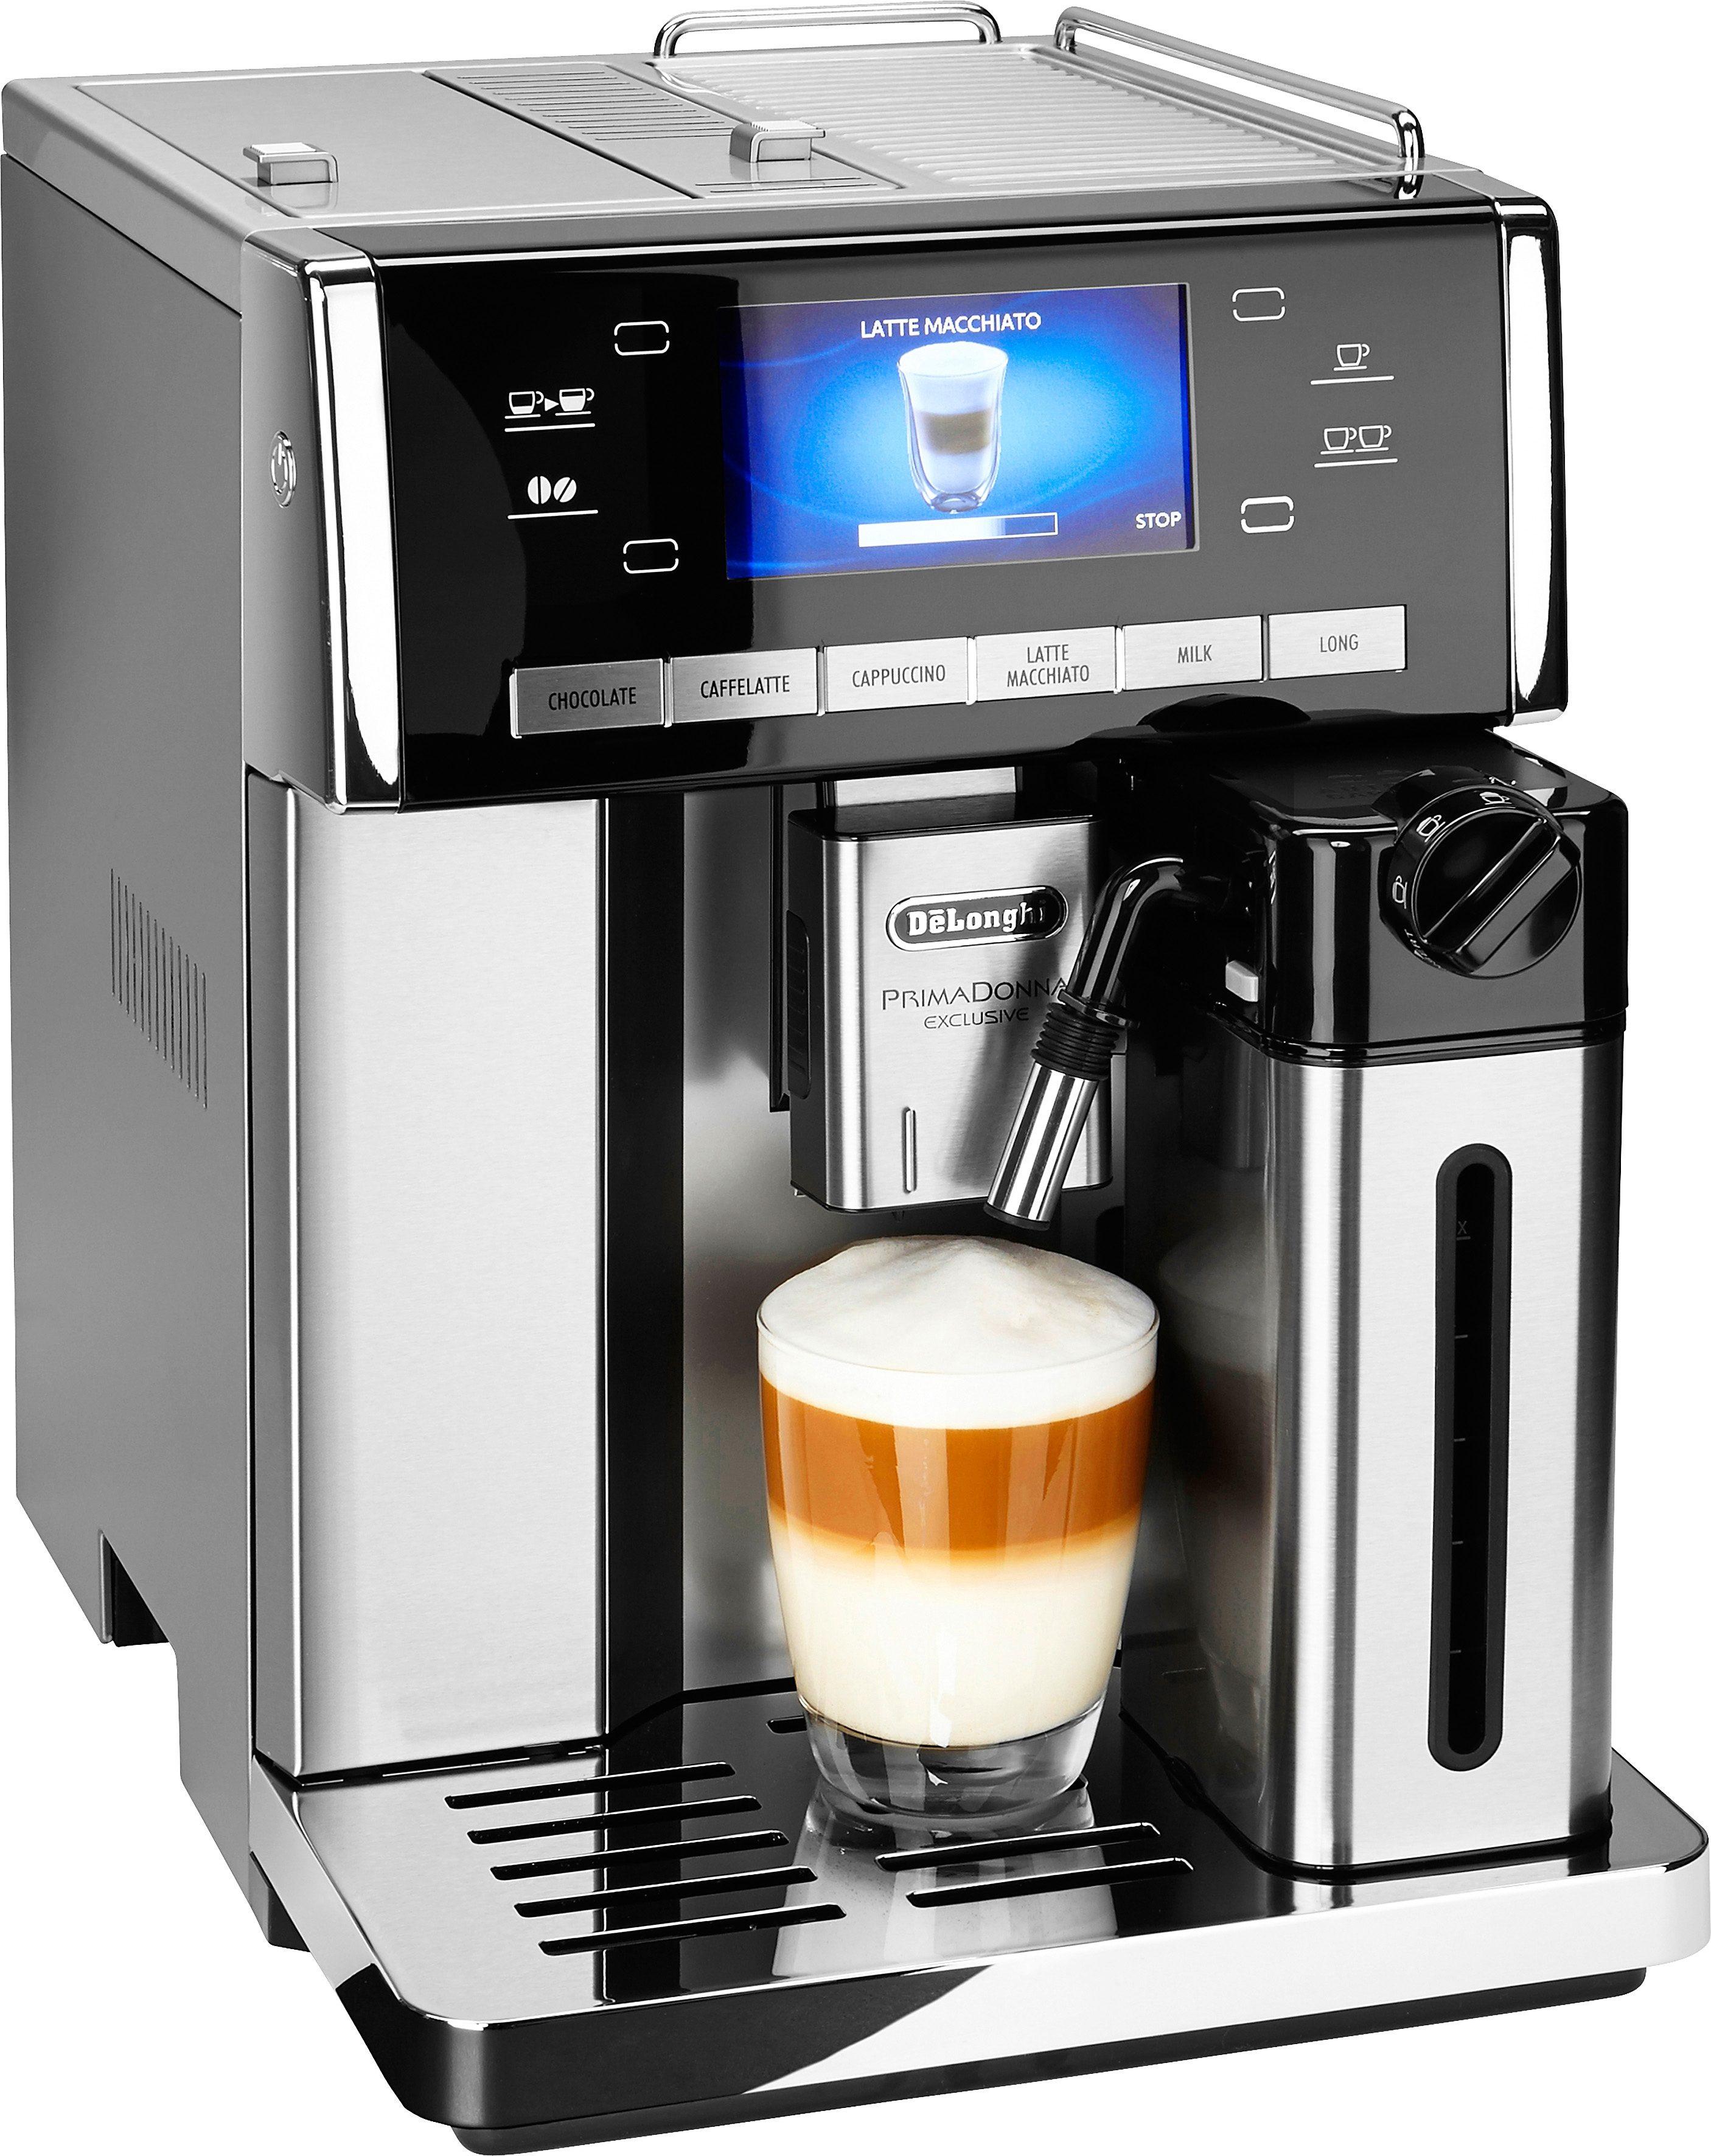 De'Longhi Kaffeevollautomat PrimaDonna Exclusive ESAM 6900.M, Trinkschokolade auf Knopfdruck